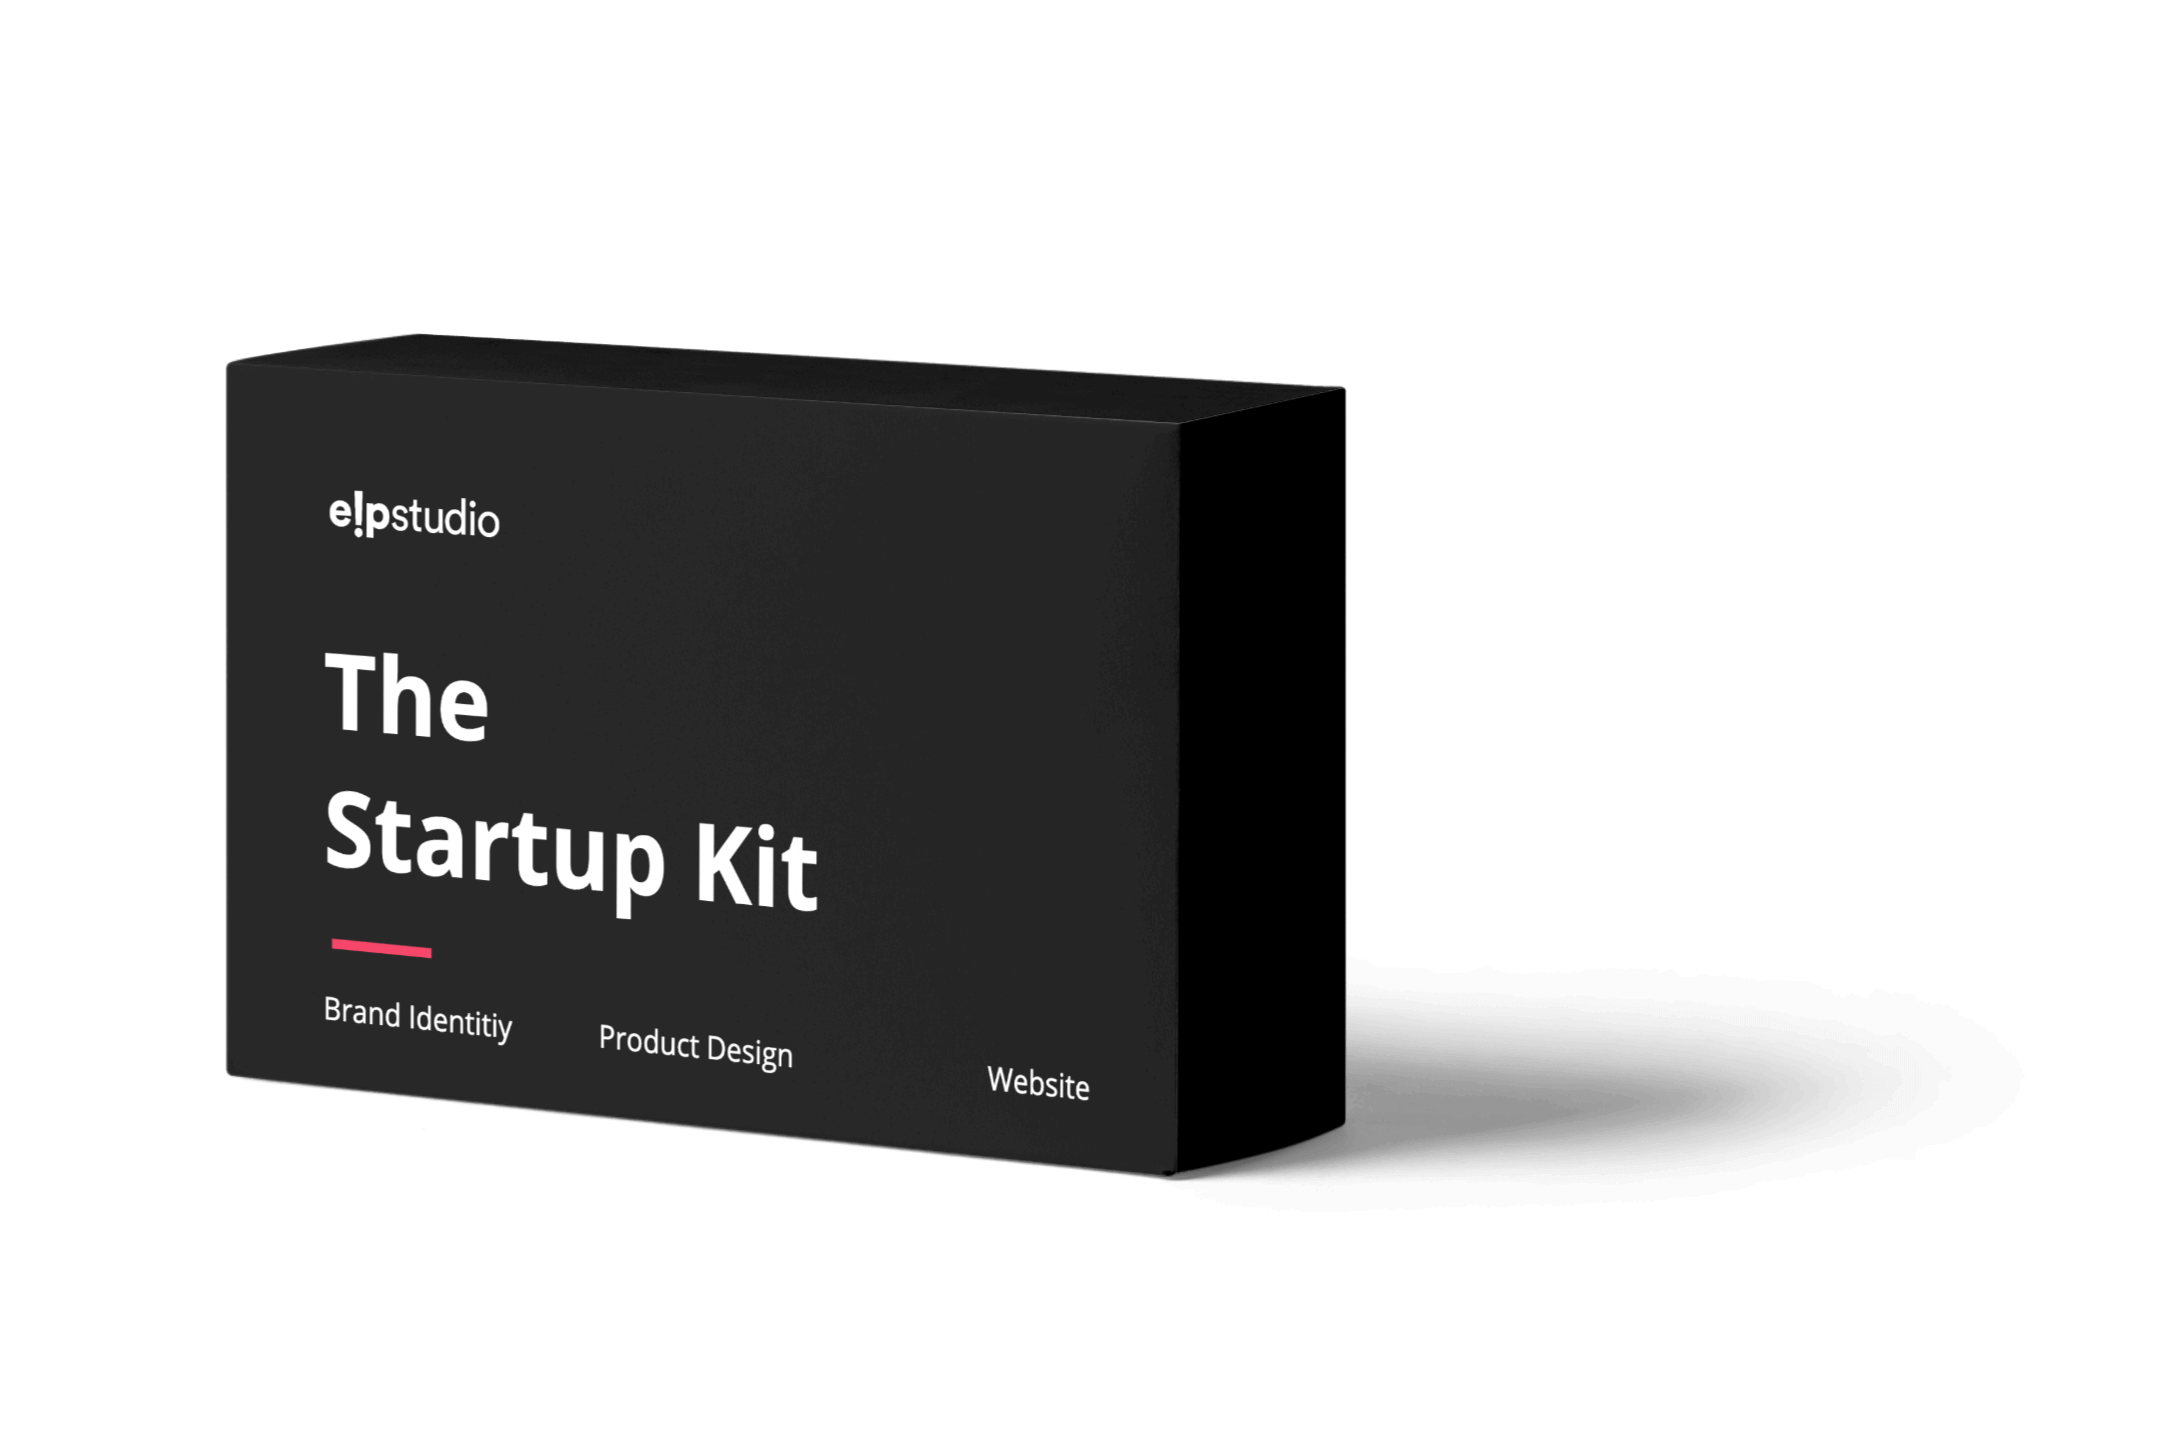 elp studip startup kit, new business design pack. the ideal design agency for startups.